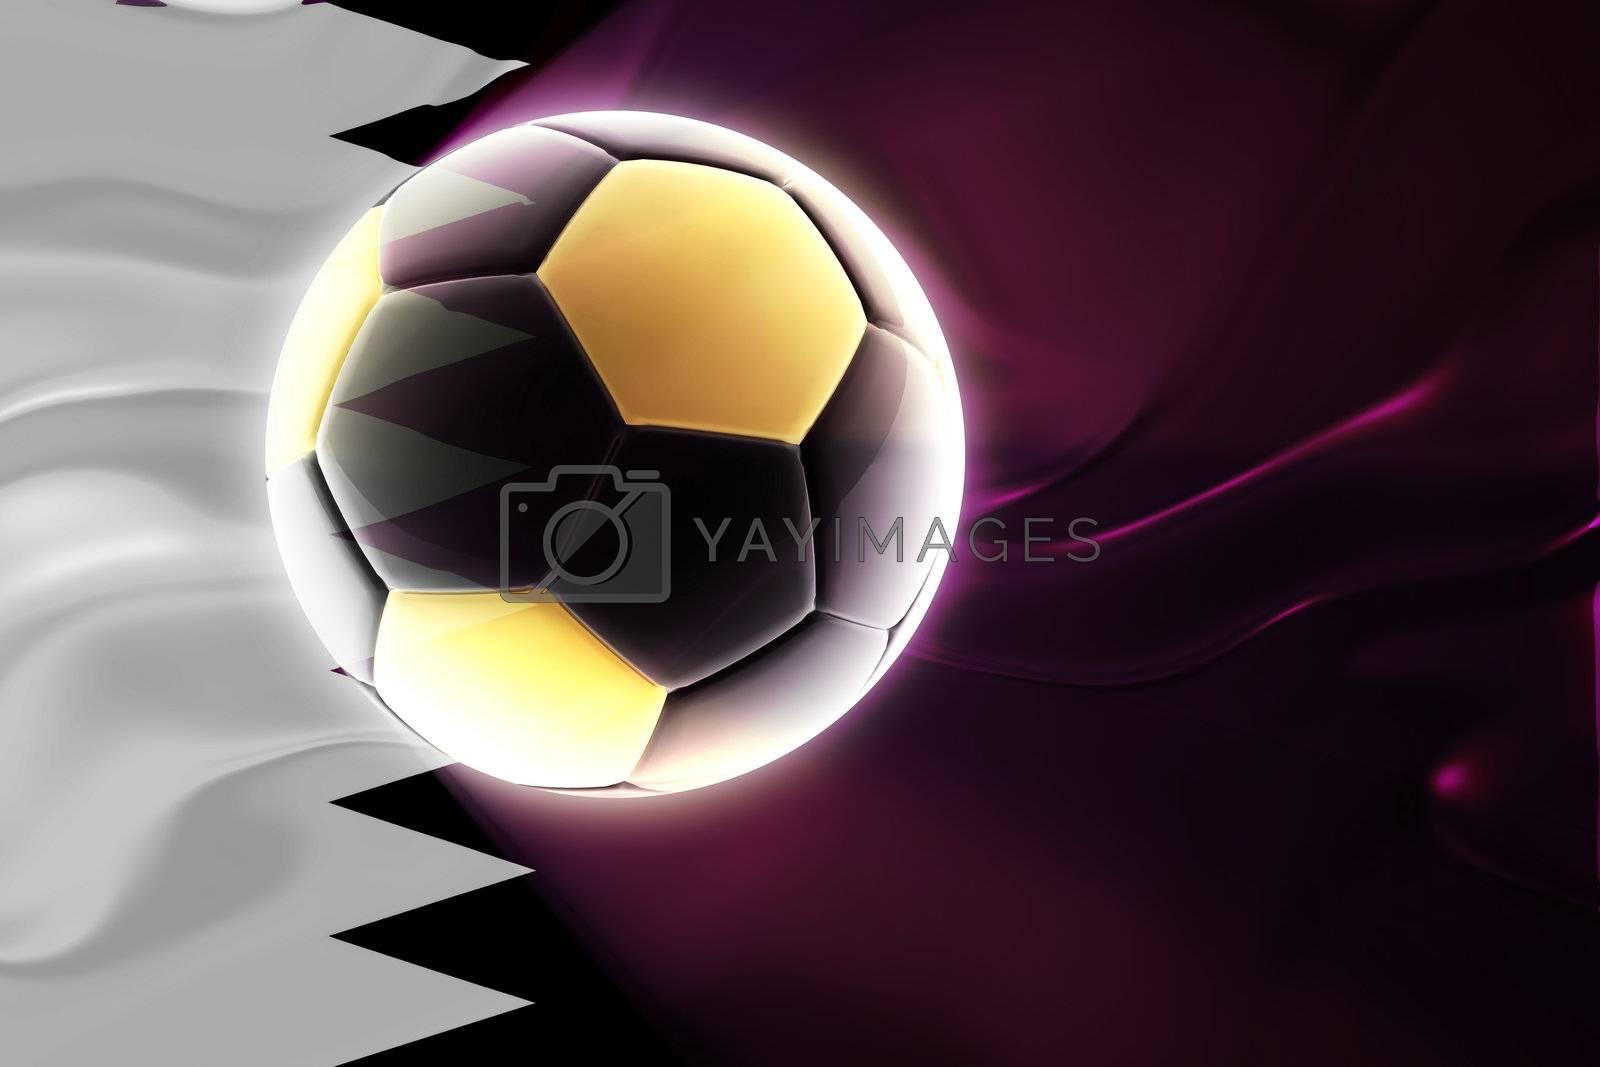 Flag of Qatar, national country symbol illustration wavy fabric sports soccer football